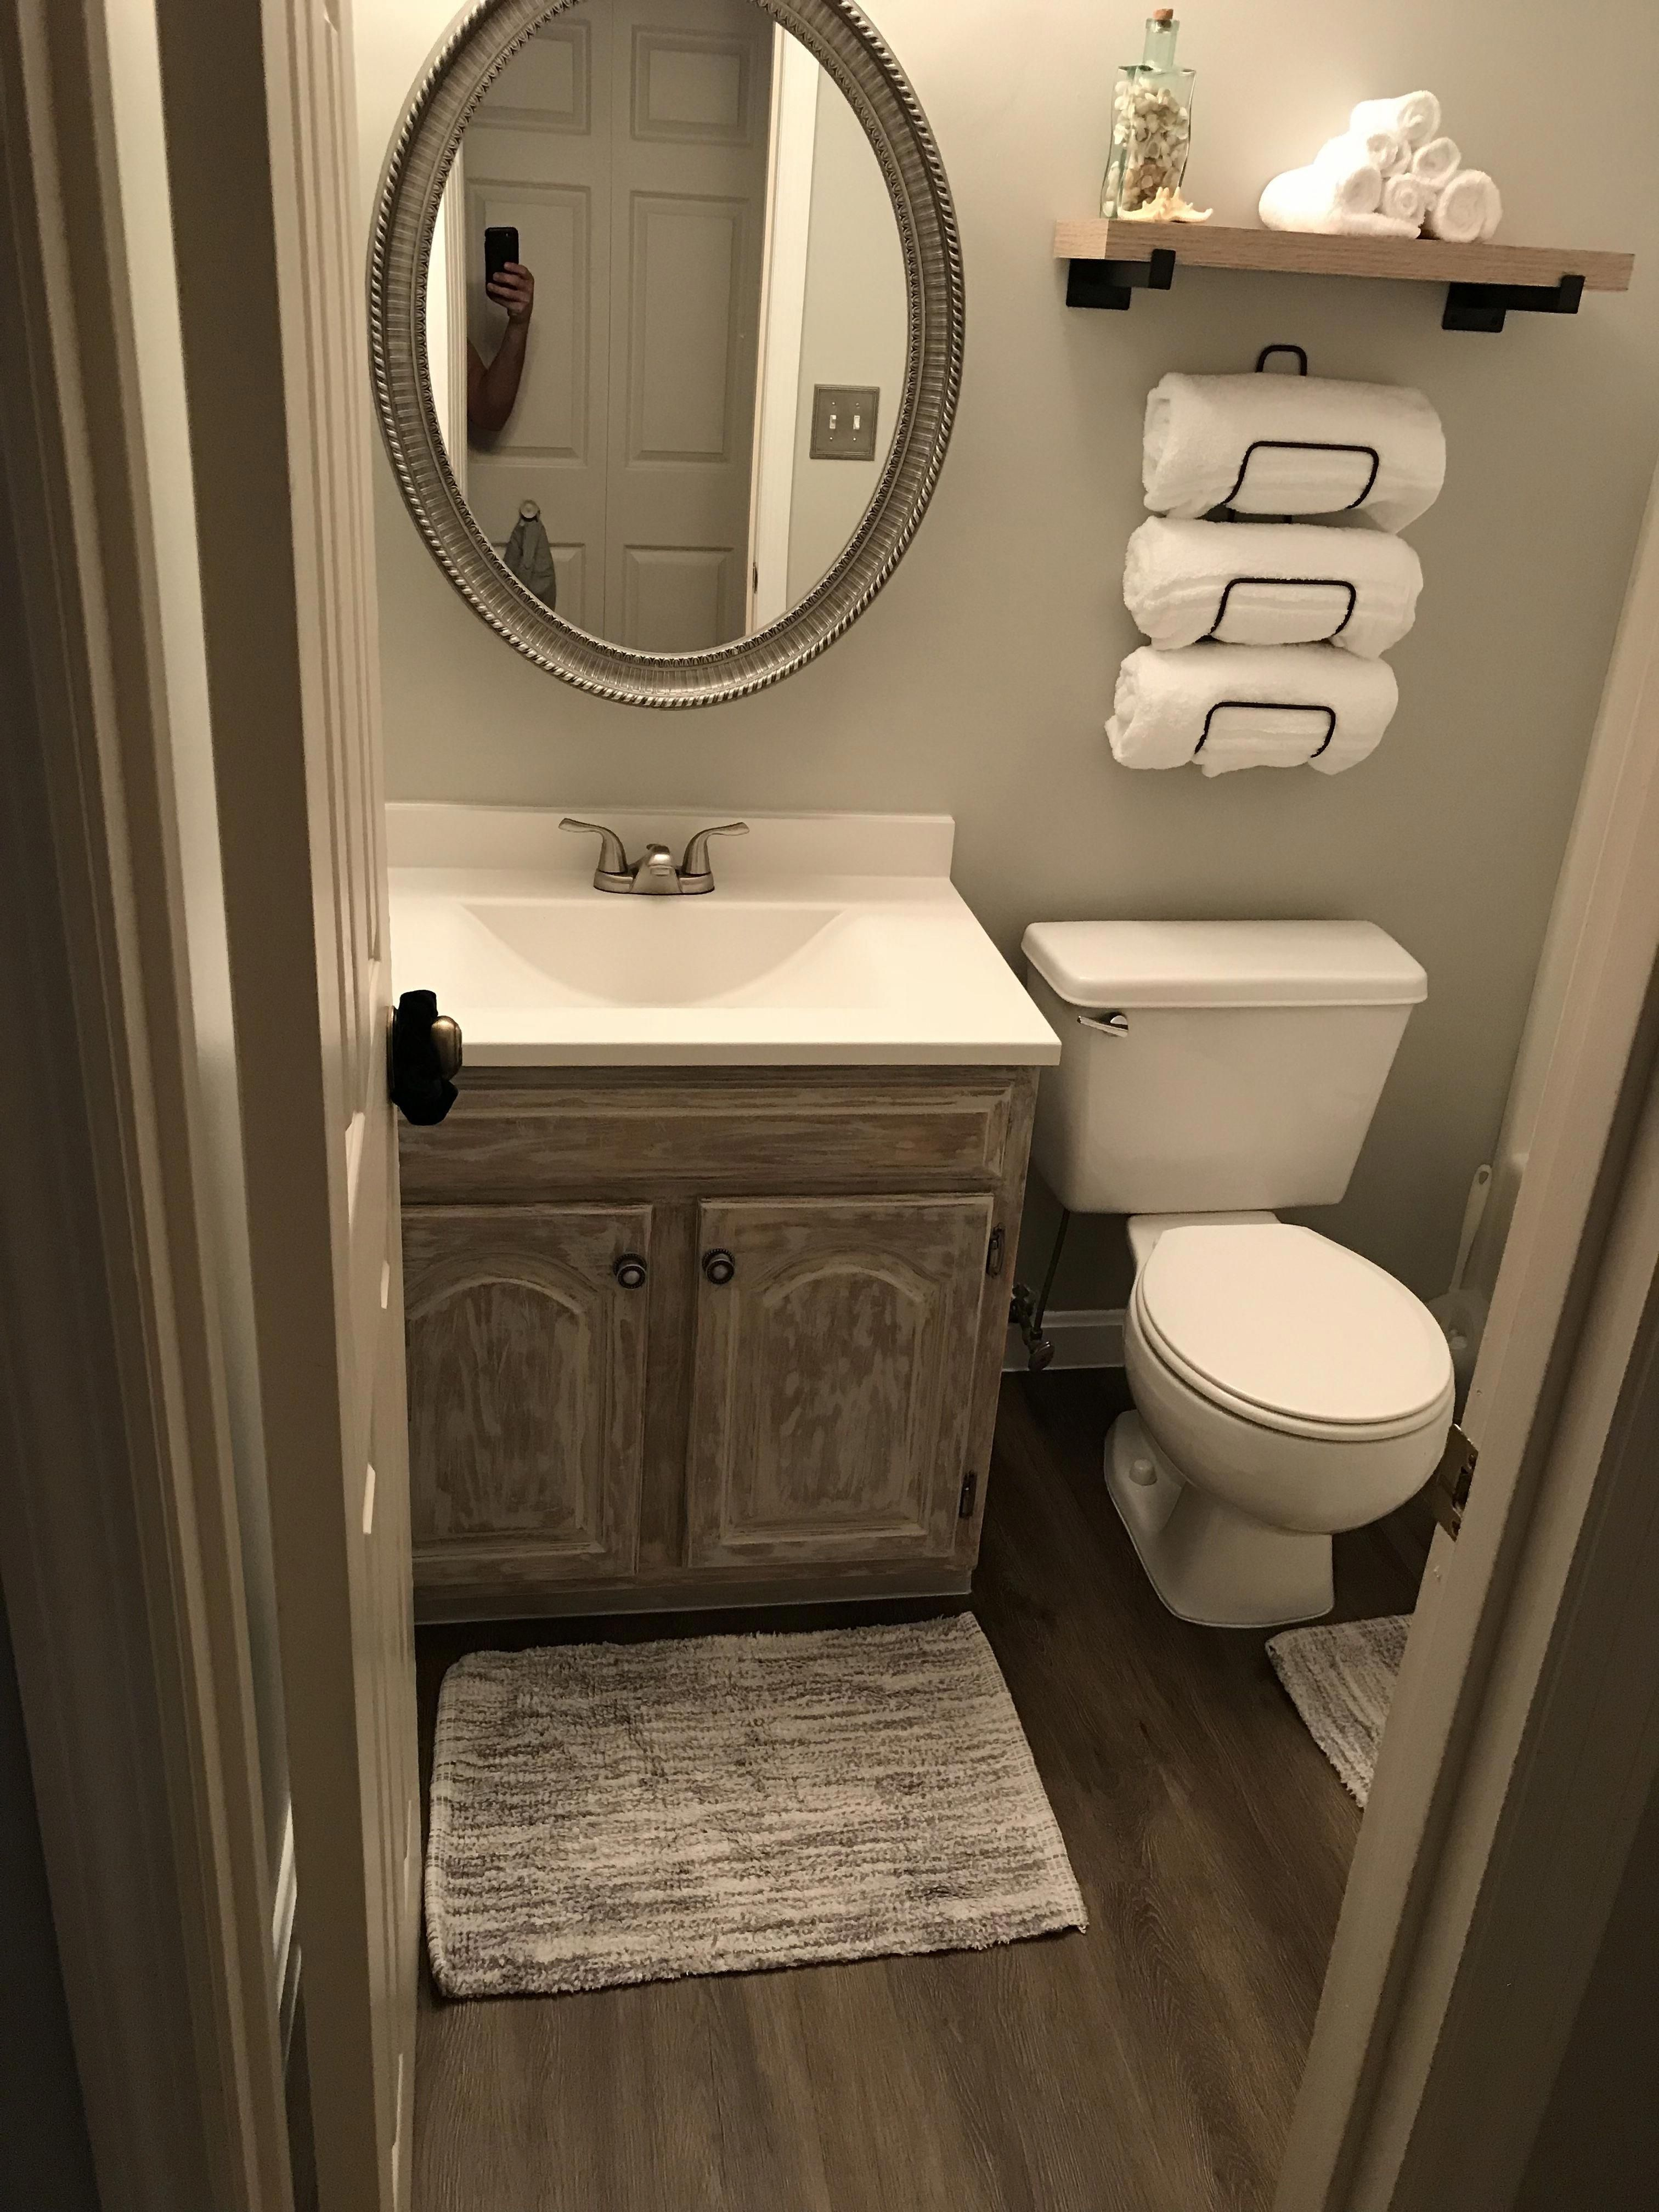 Bathroom Design Hdb Bathroomdesignhdb Small Bathroom Natural